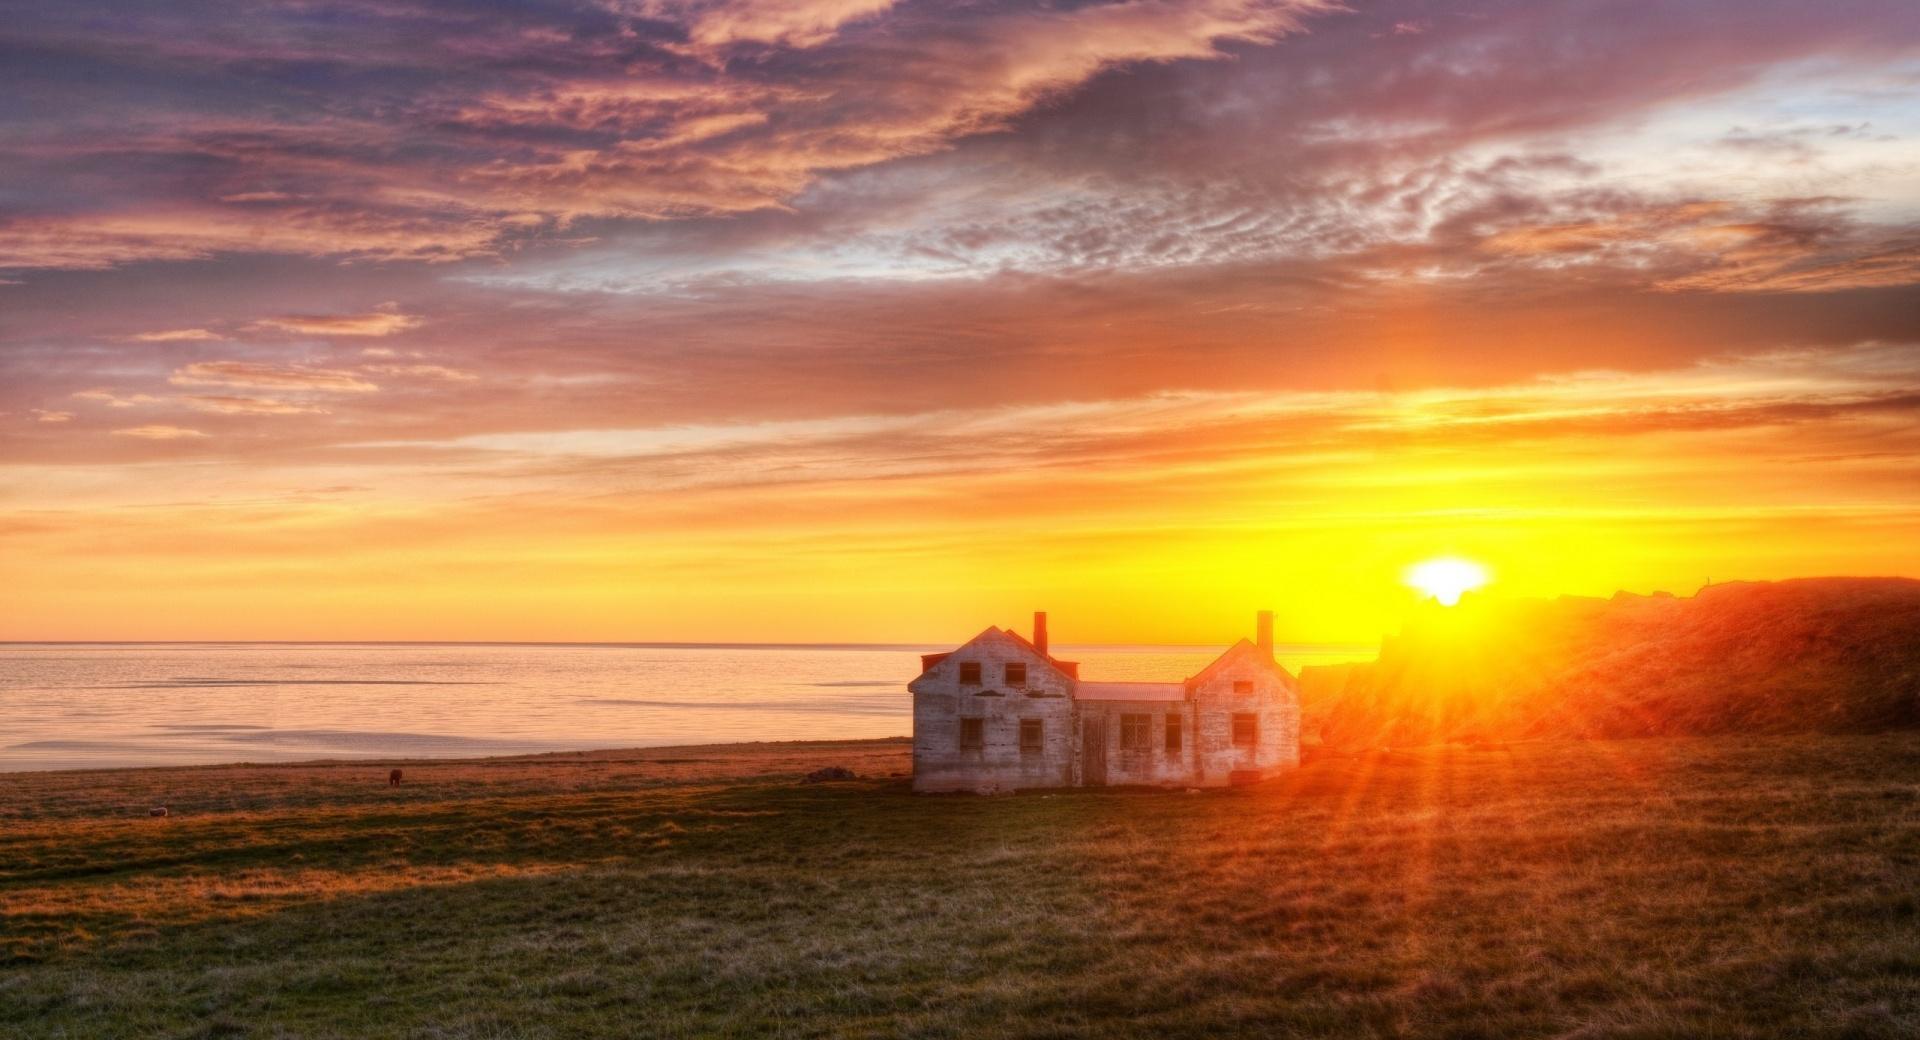 North Atlantic Sunrise wallpapers HD quality